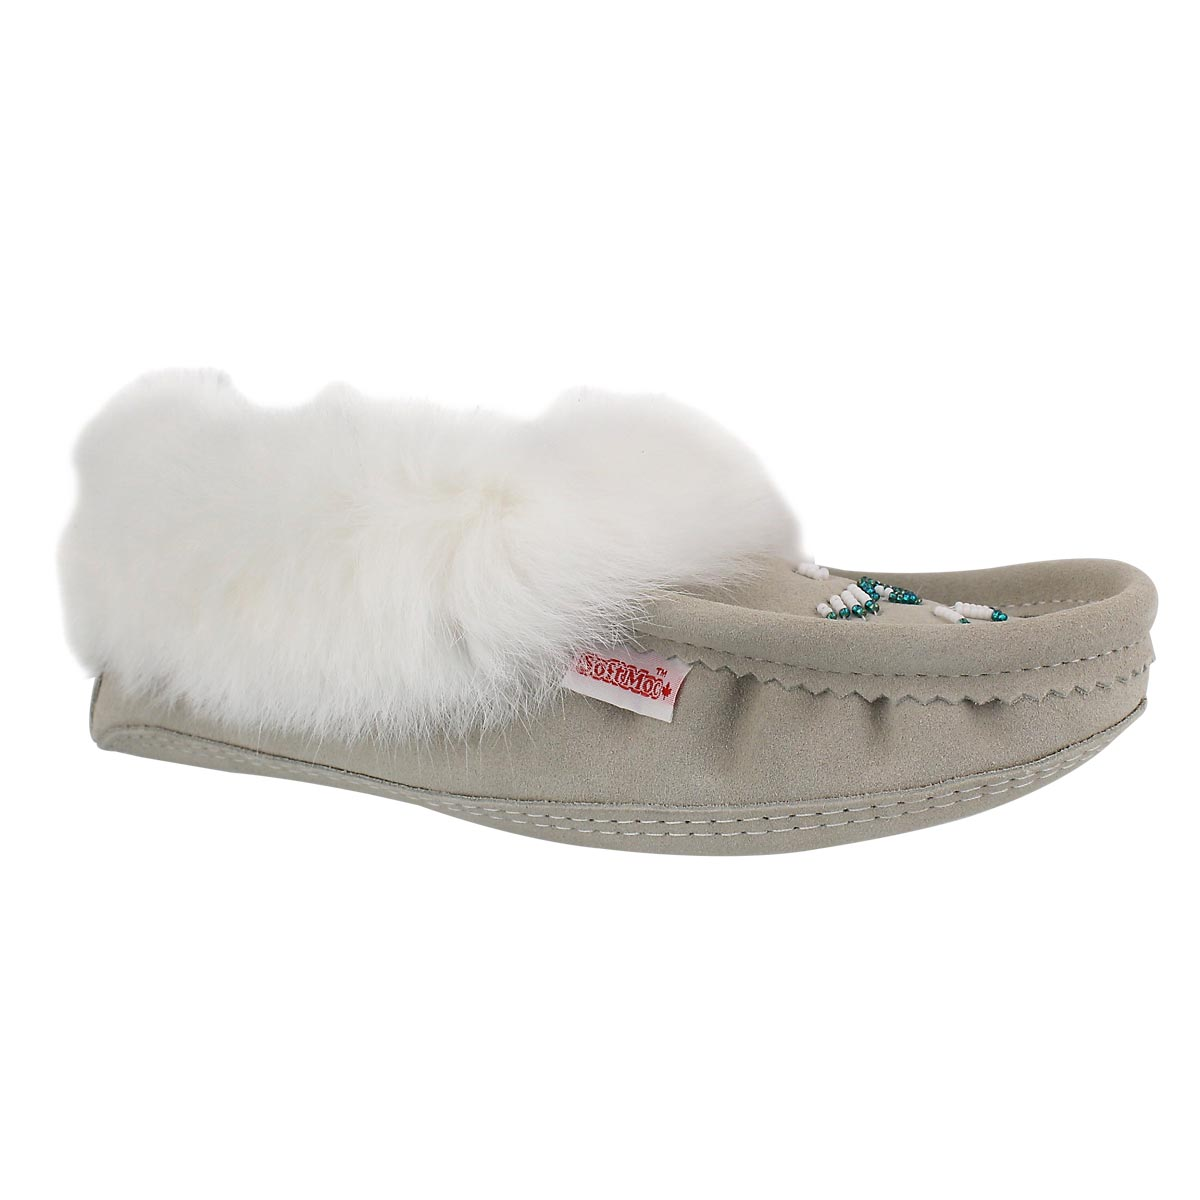 Lds ice rabbit fur moccasin